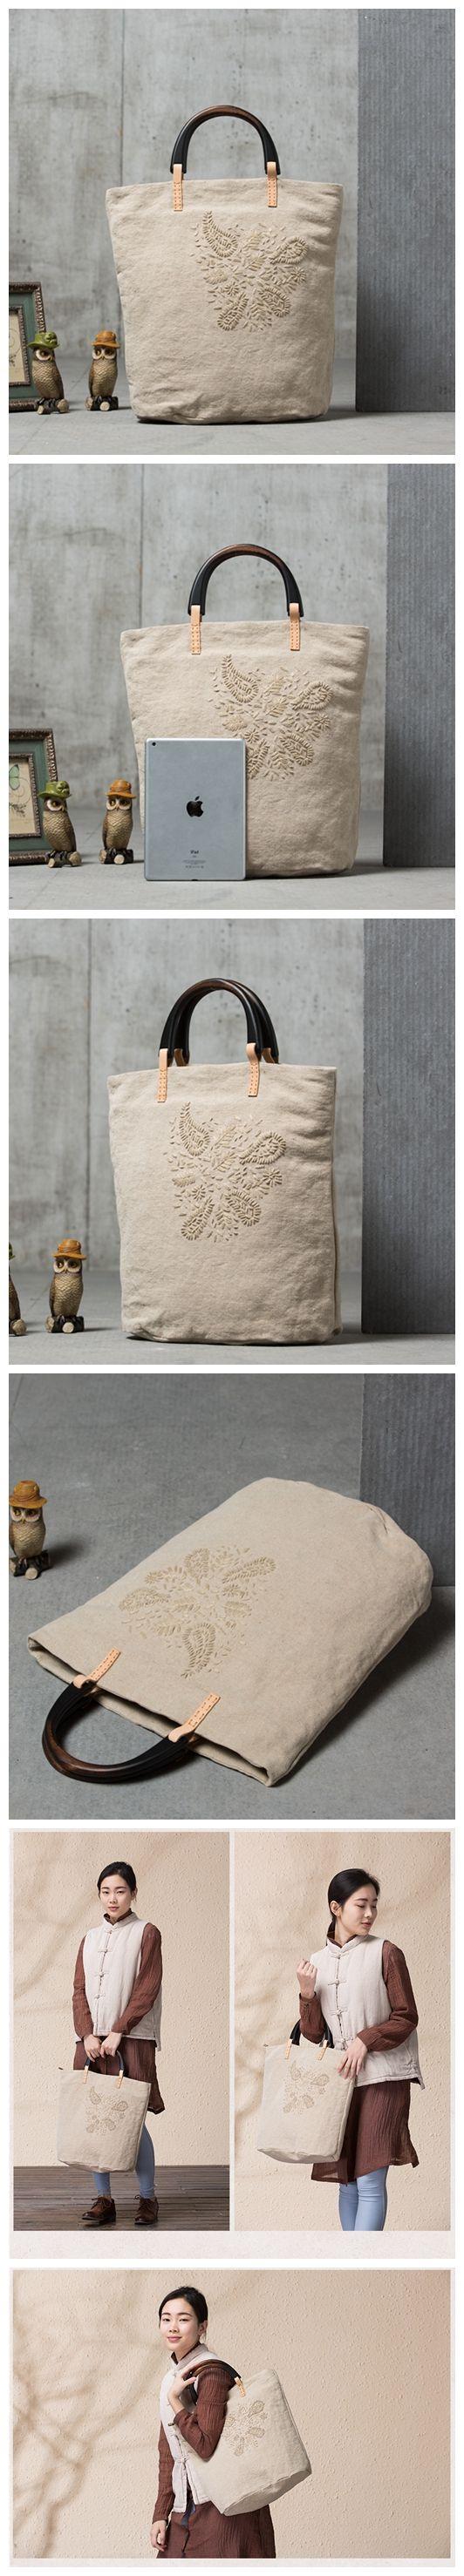 Original Cotton and Linen Tote Bag Hand Embroidery Handbag for Women ... 511809734